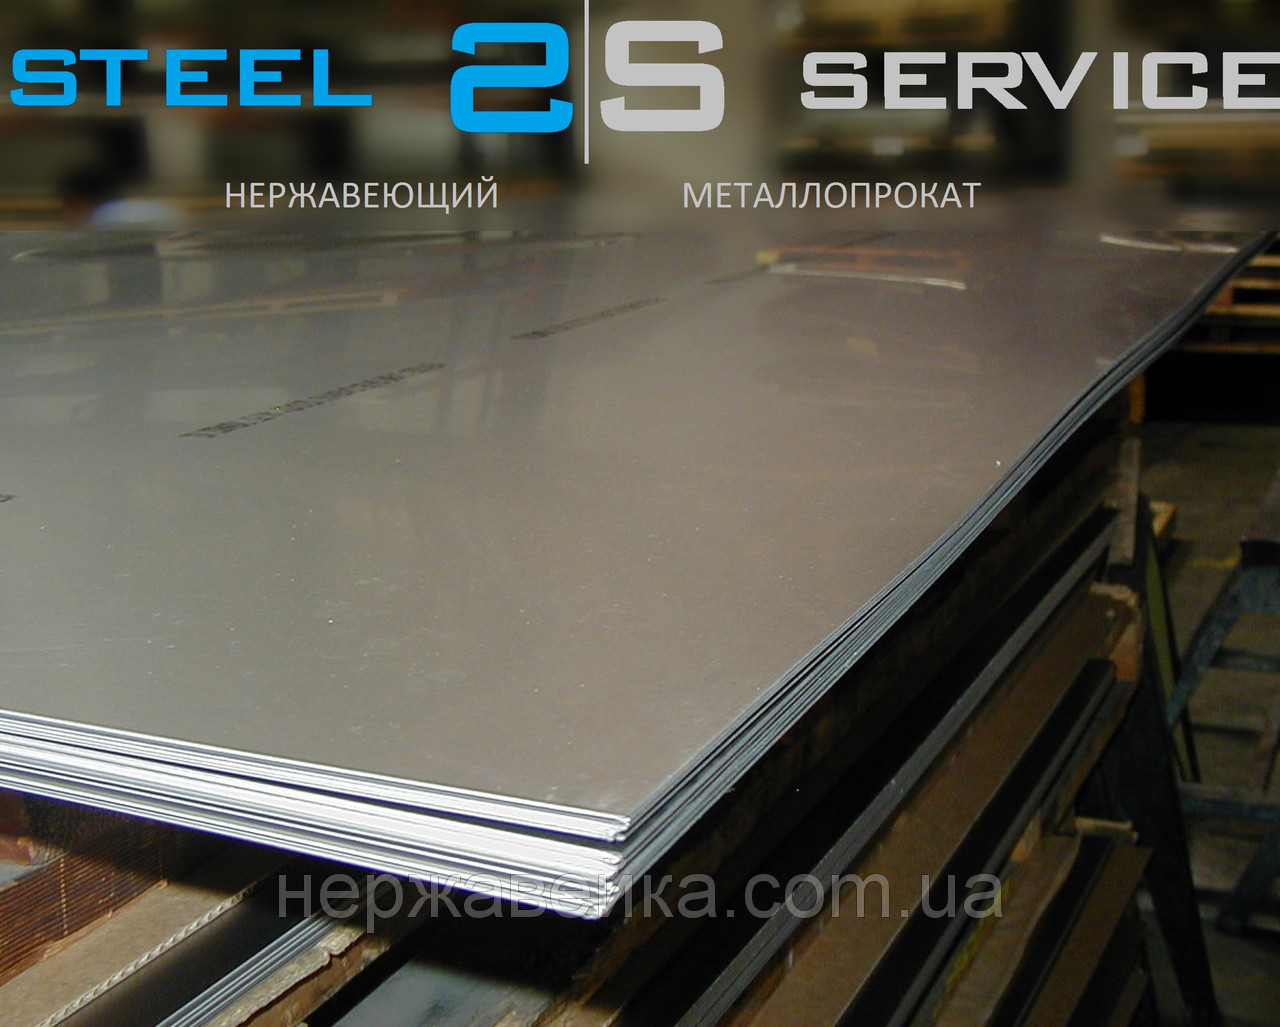 Нержавеющий лист 1х1500х3000мм AISI 430(12Х17) 2B - матовый, технический